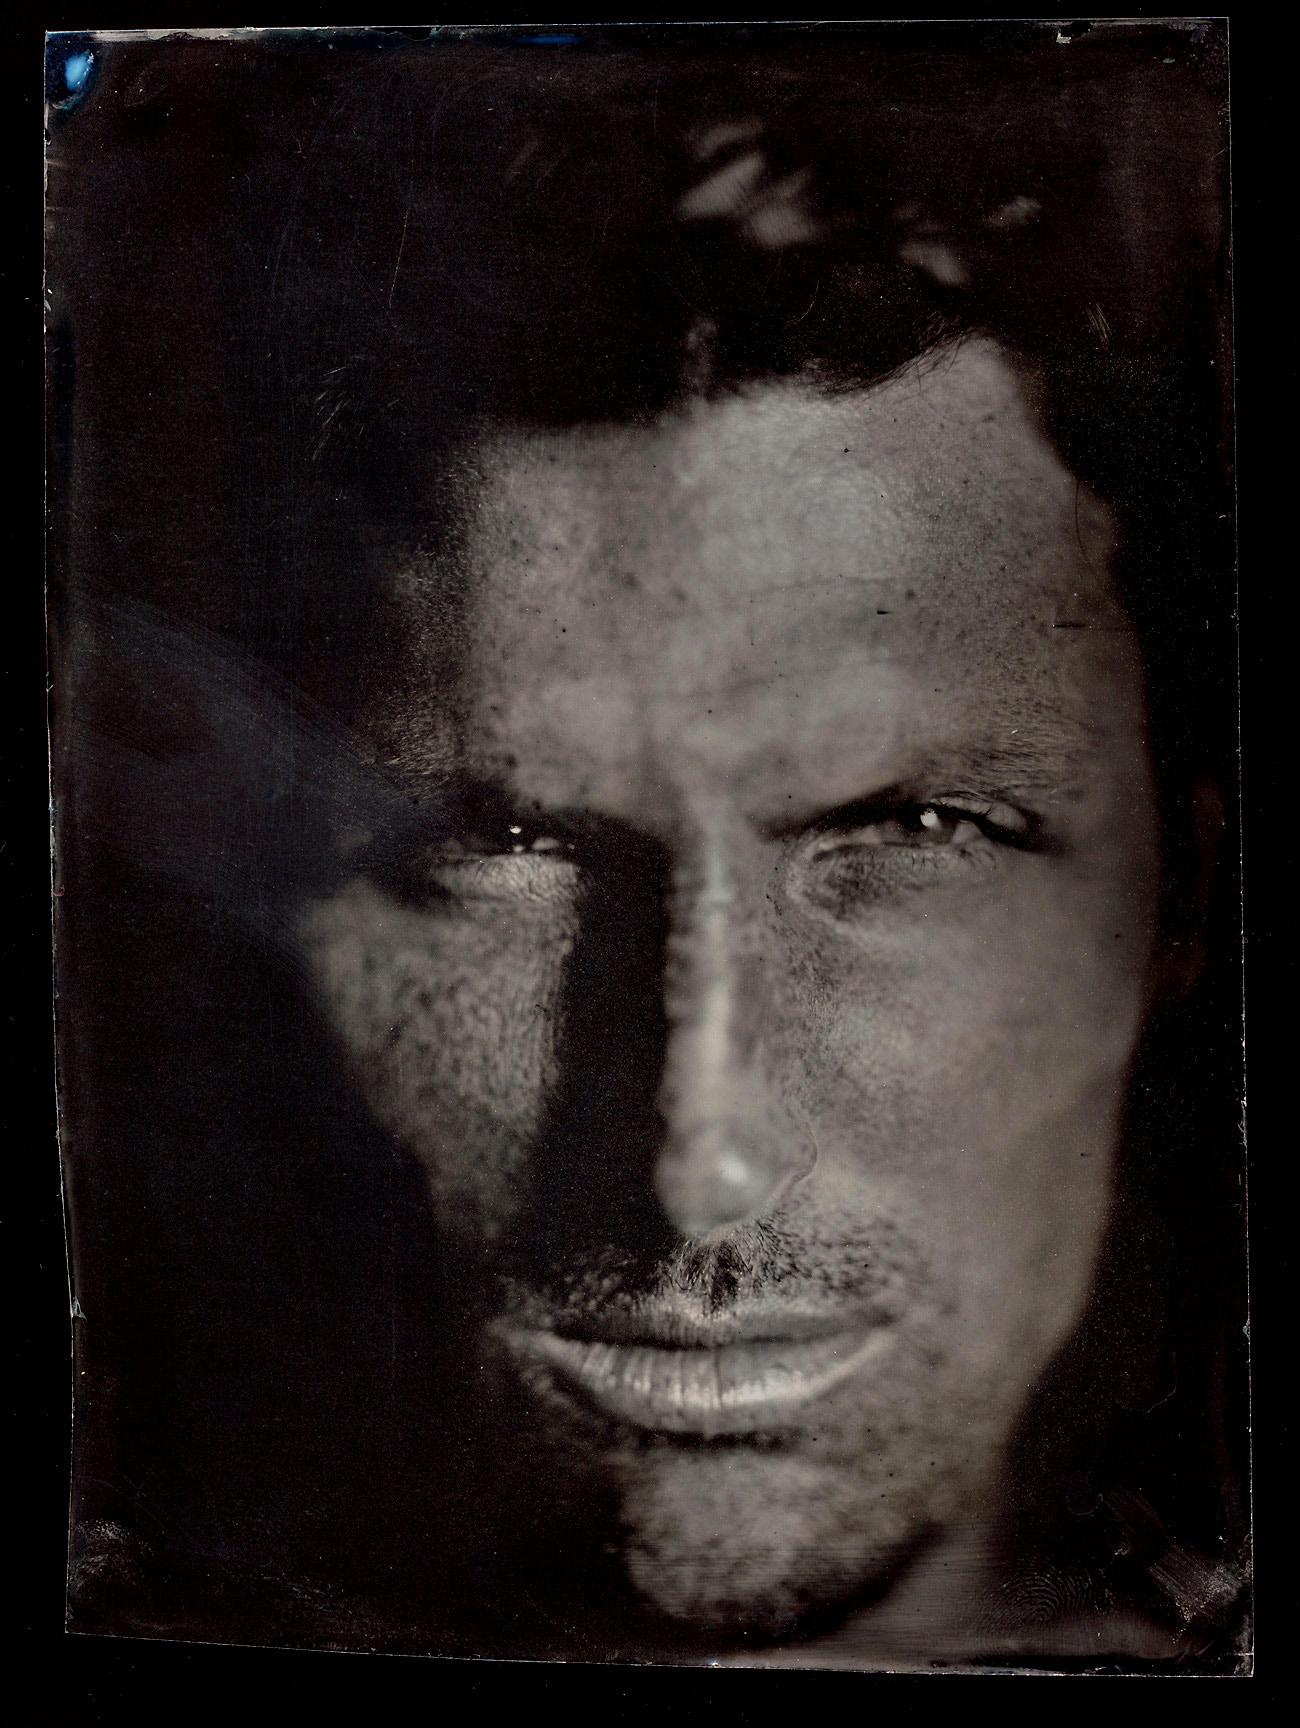 JAMES-WEBER-PHOTOGRAPHER-PORTRAITS-13473.jpg